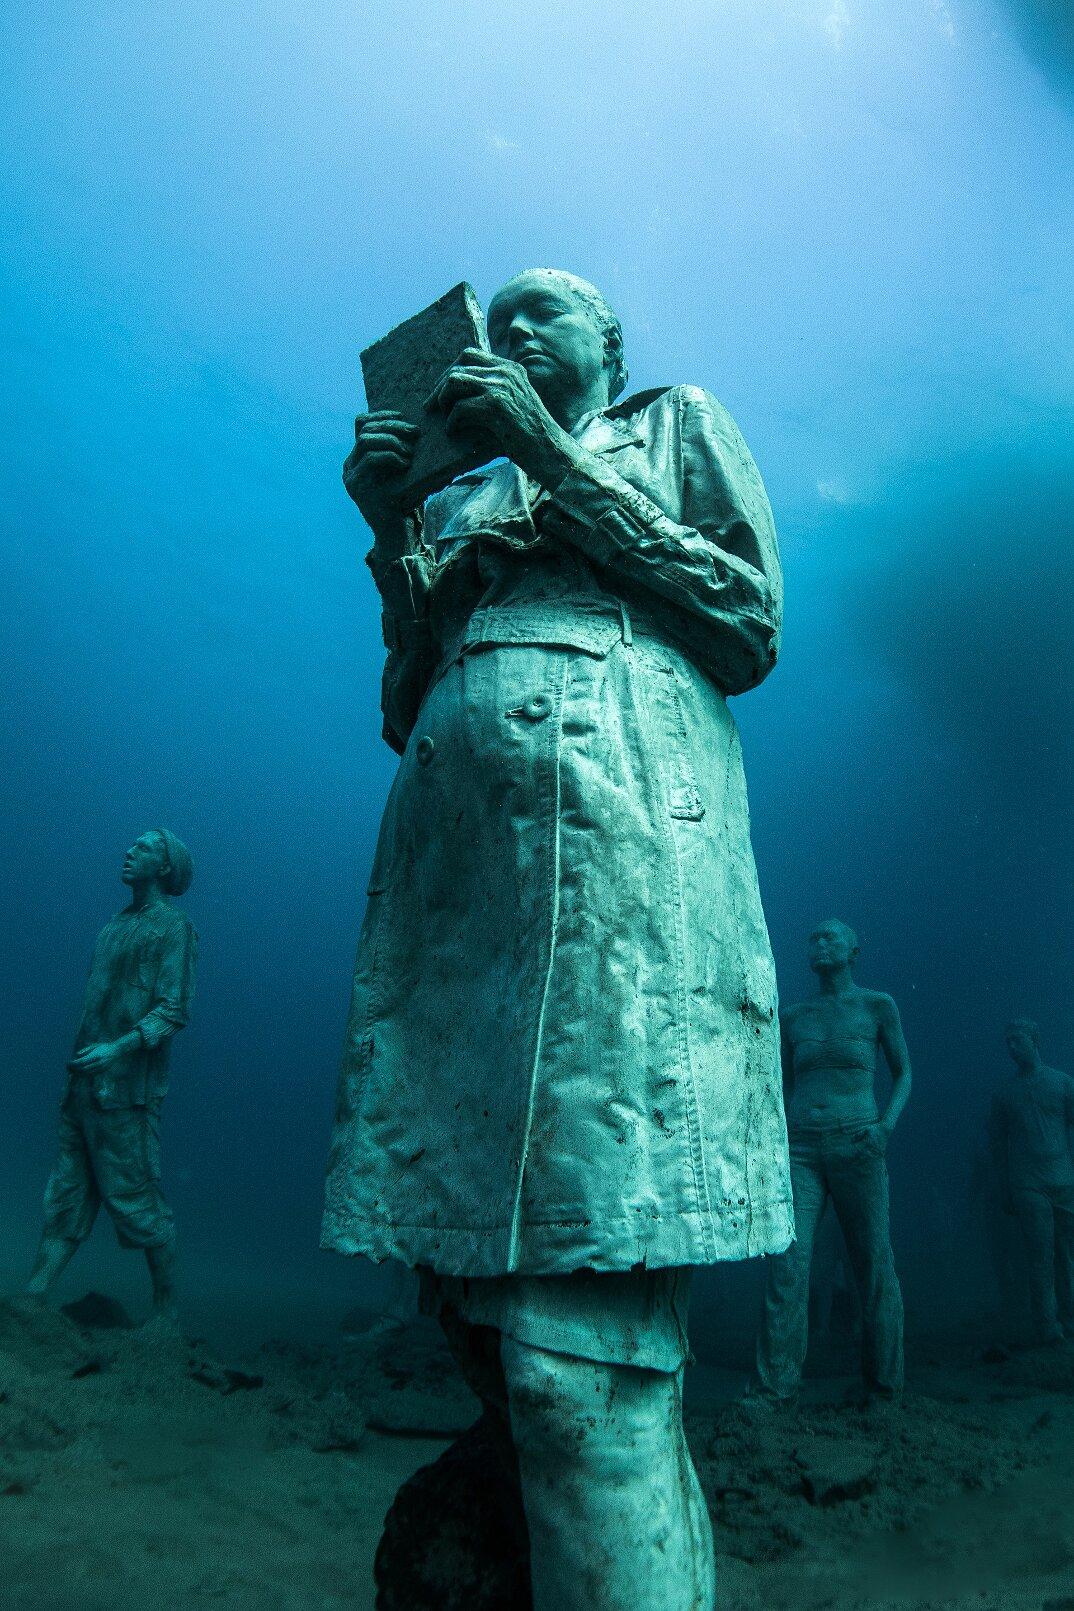 sculture-sottomarine-museo-atlantico-jason-decaires-taylor-03